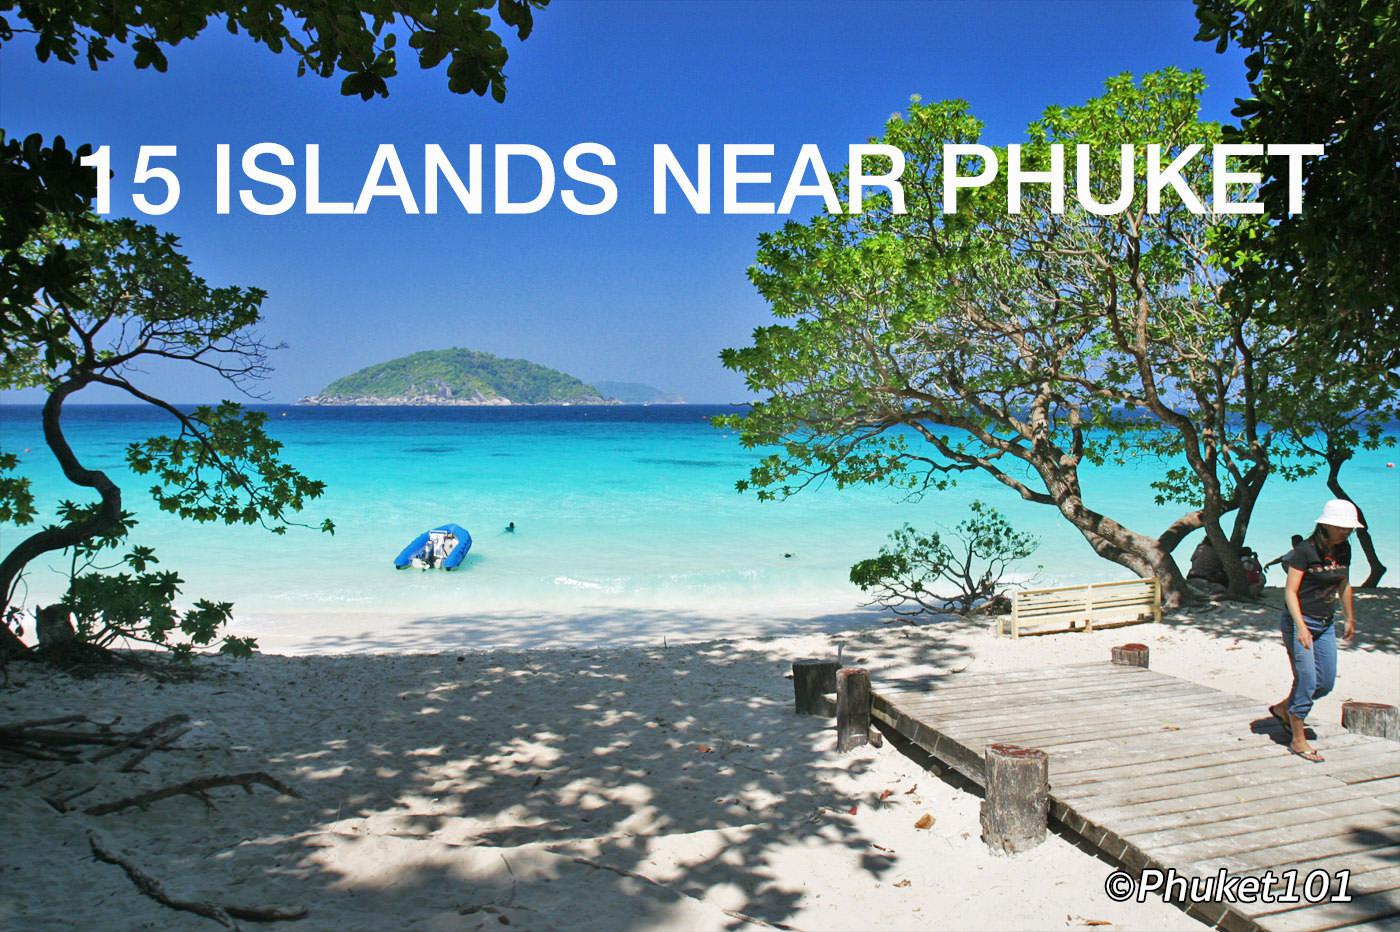 15 Islands Near Phuket (updated)